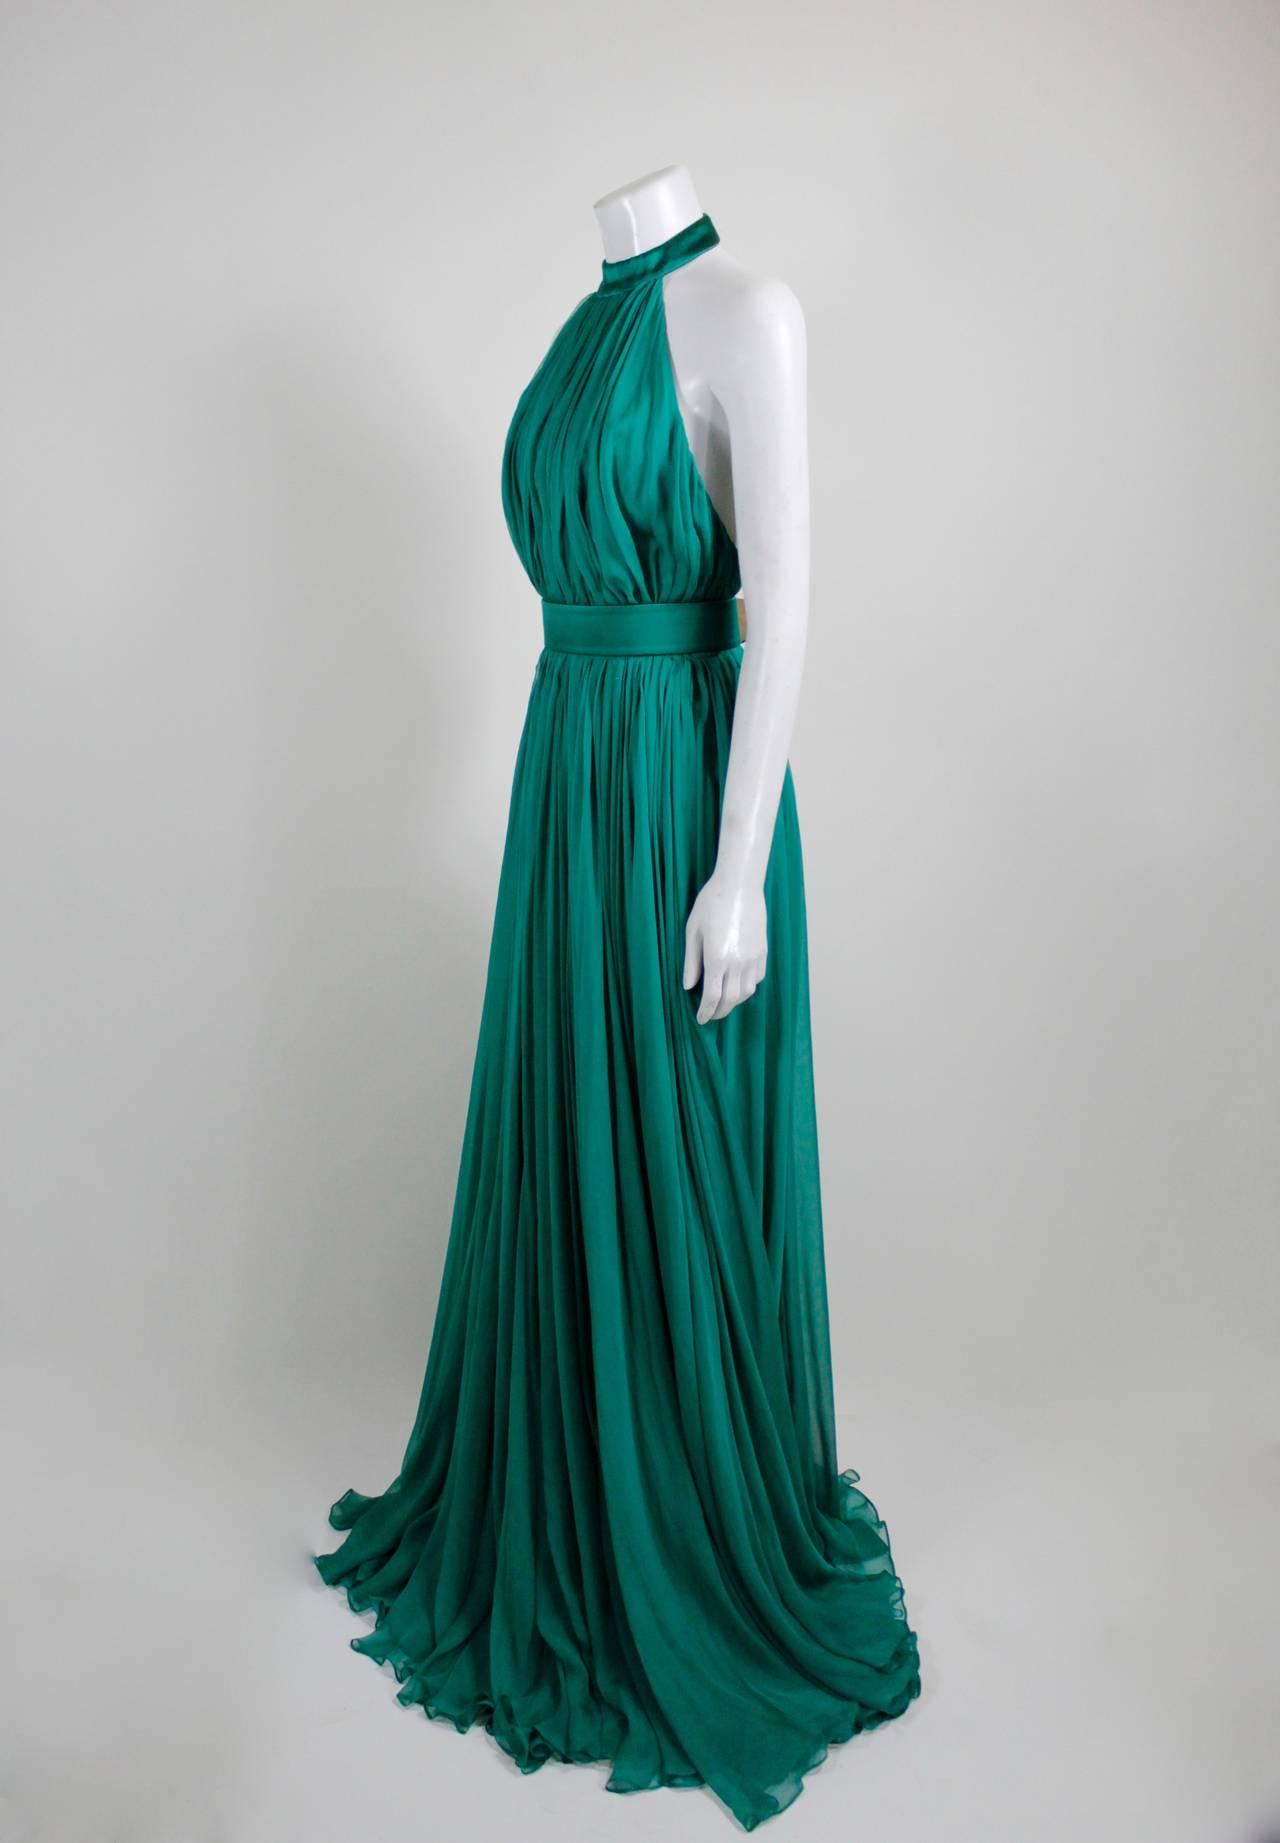 Alexander McQueen 2010 Flowing Emerald Green Chiffon Halter Gown with Belt 4